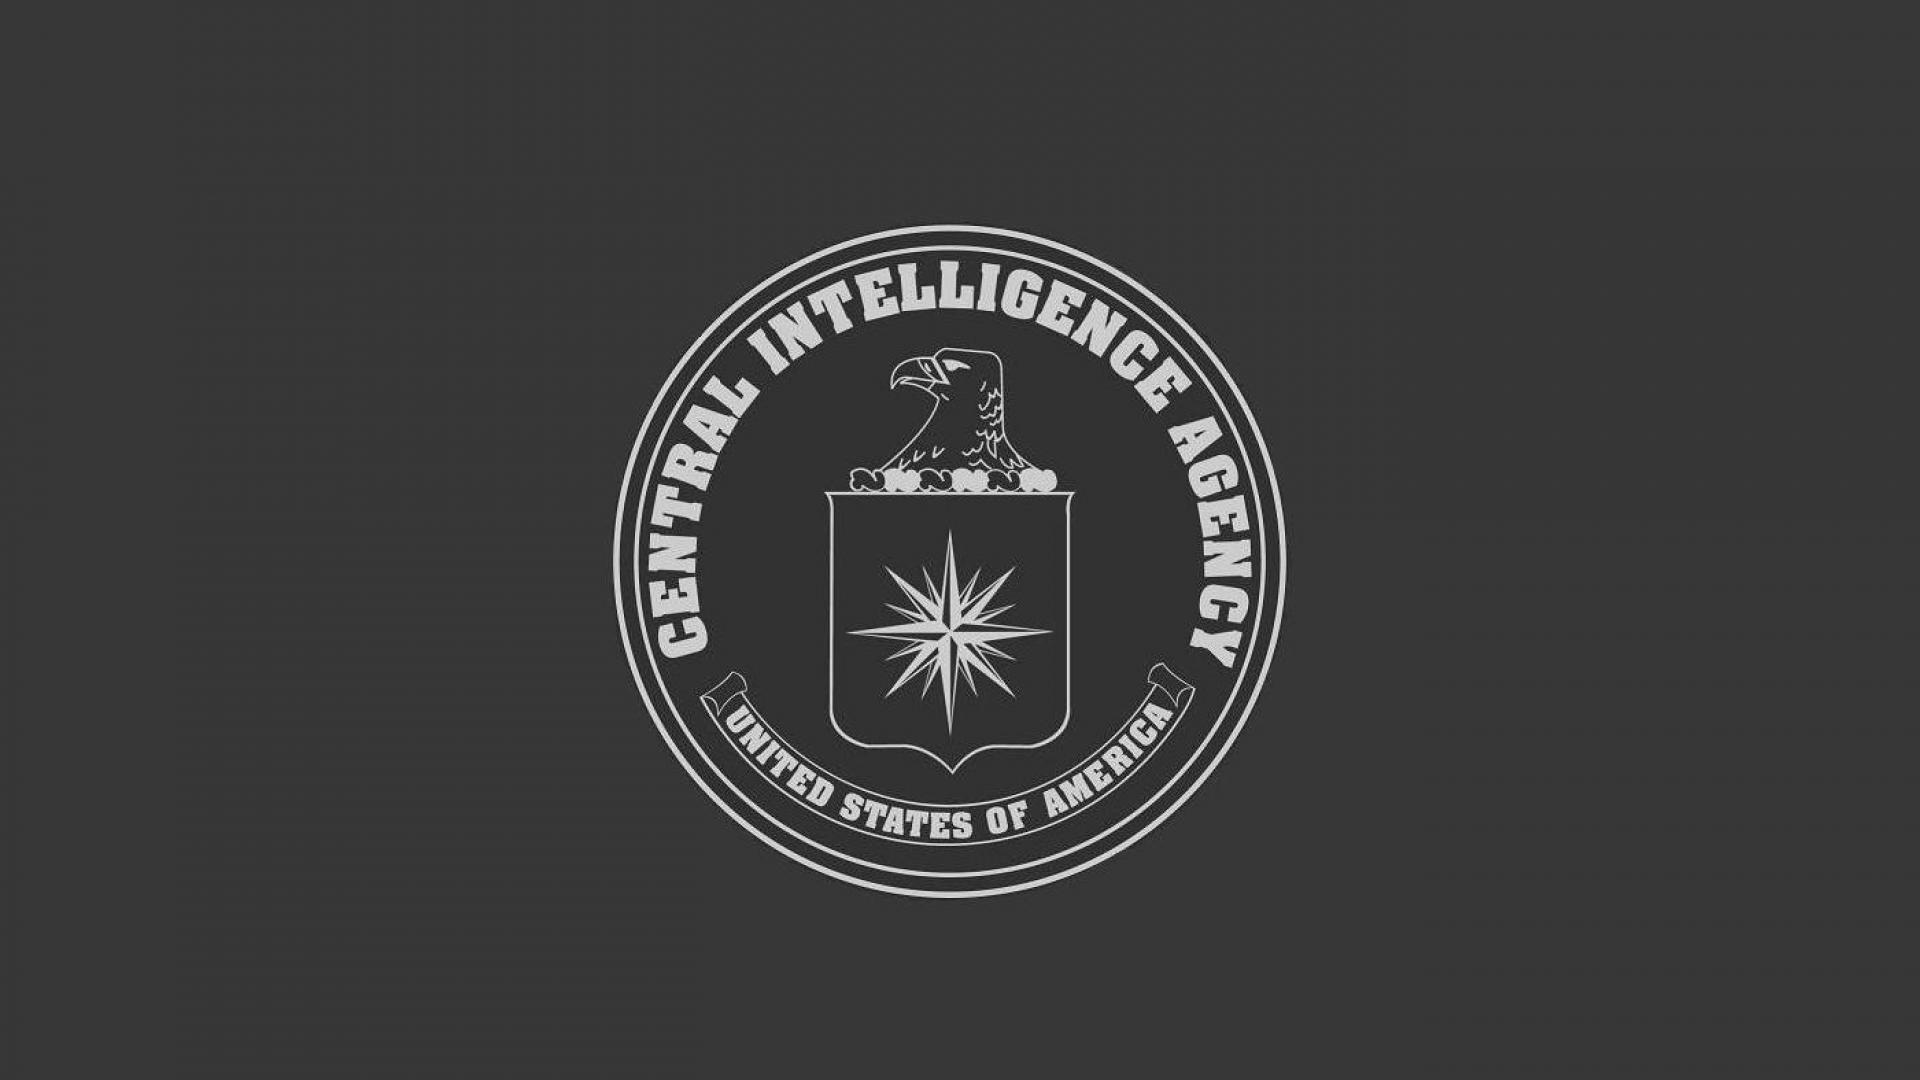 CIA Central Intelligence Agency crime usa america spy logo wallpaper 1920x1080